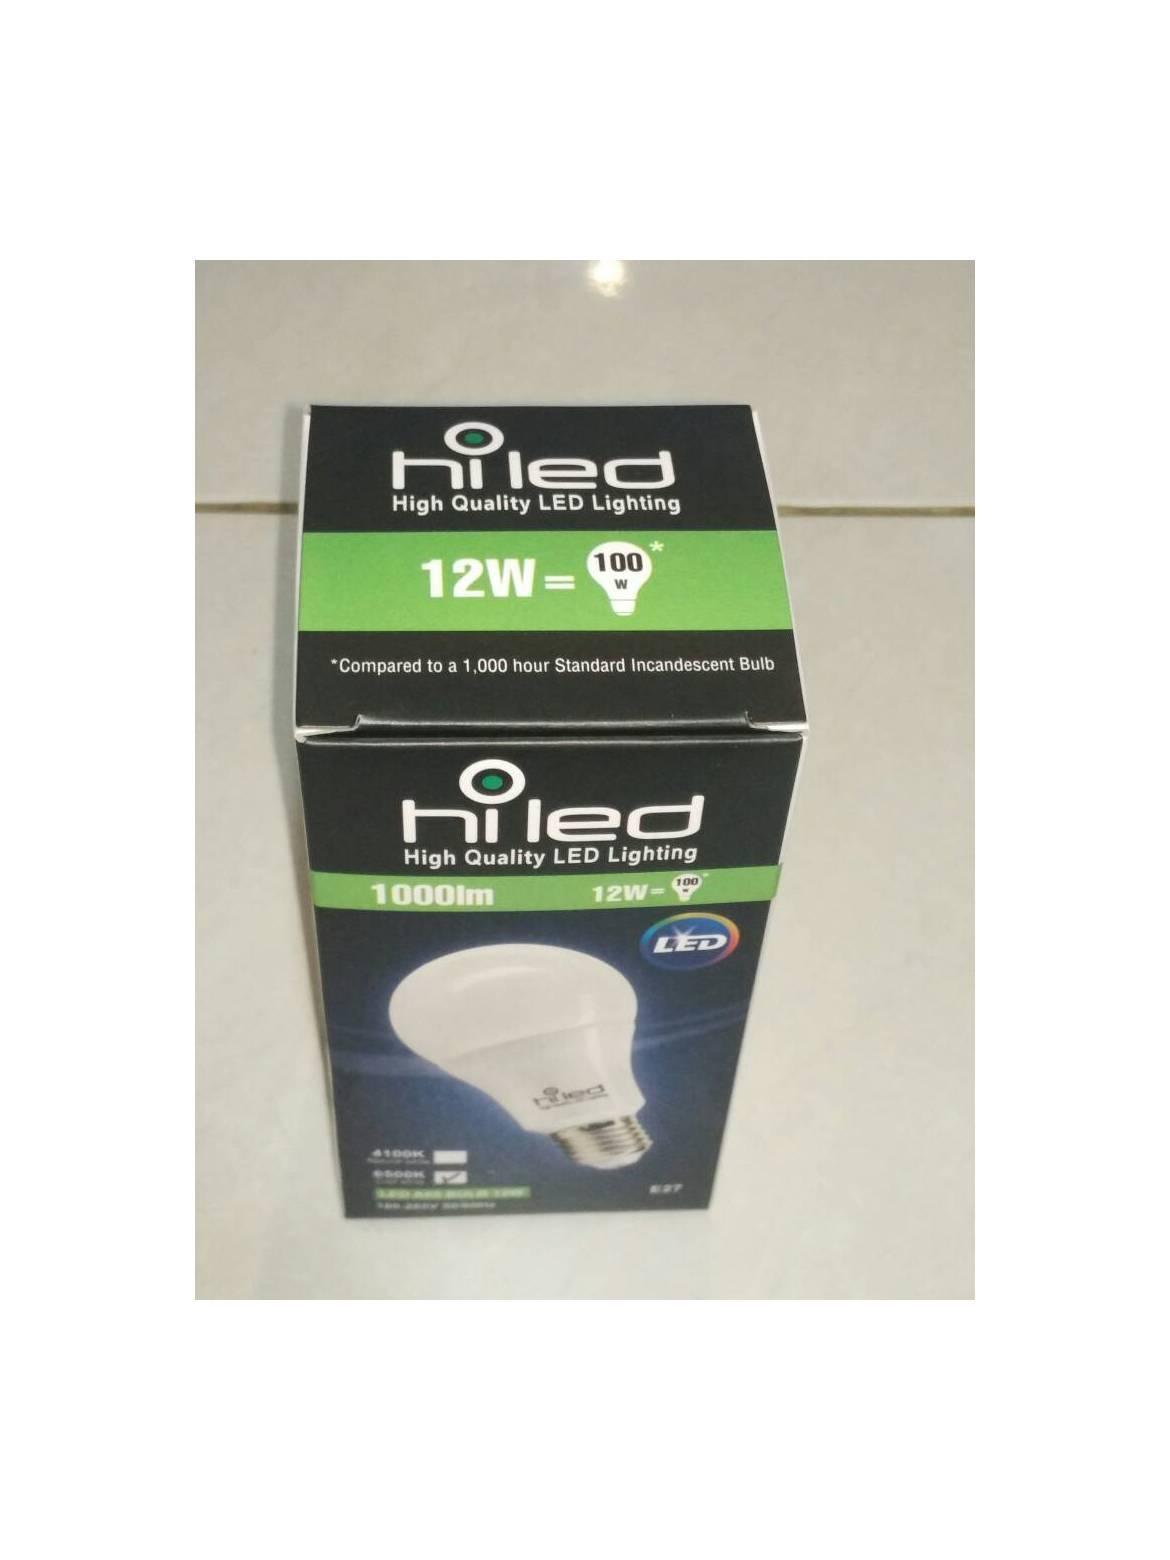 Hiled Bohlam LED Bulb 220V 9W White Non Dimmable – Garansi 24 Bulan. IDR 85,000 IDR85000. View Detail. Hiled Bulb/Bohlam 12Watt Natural White E27